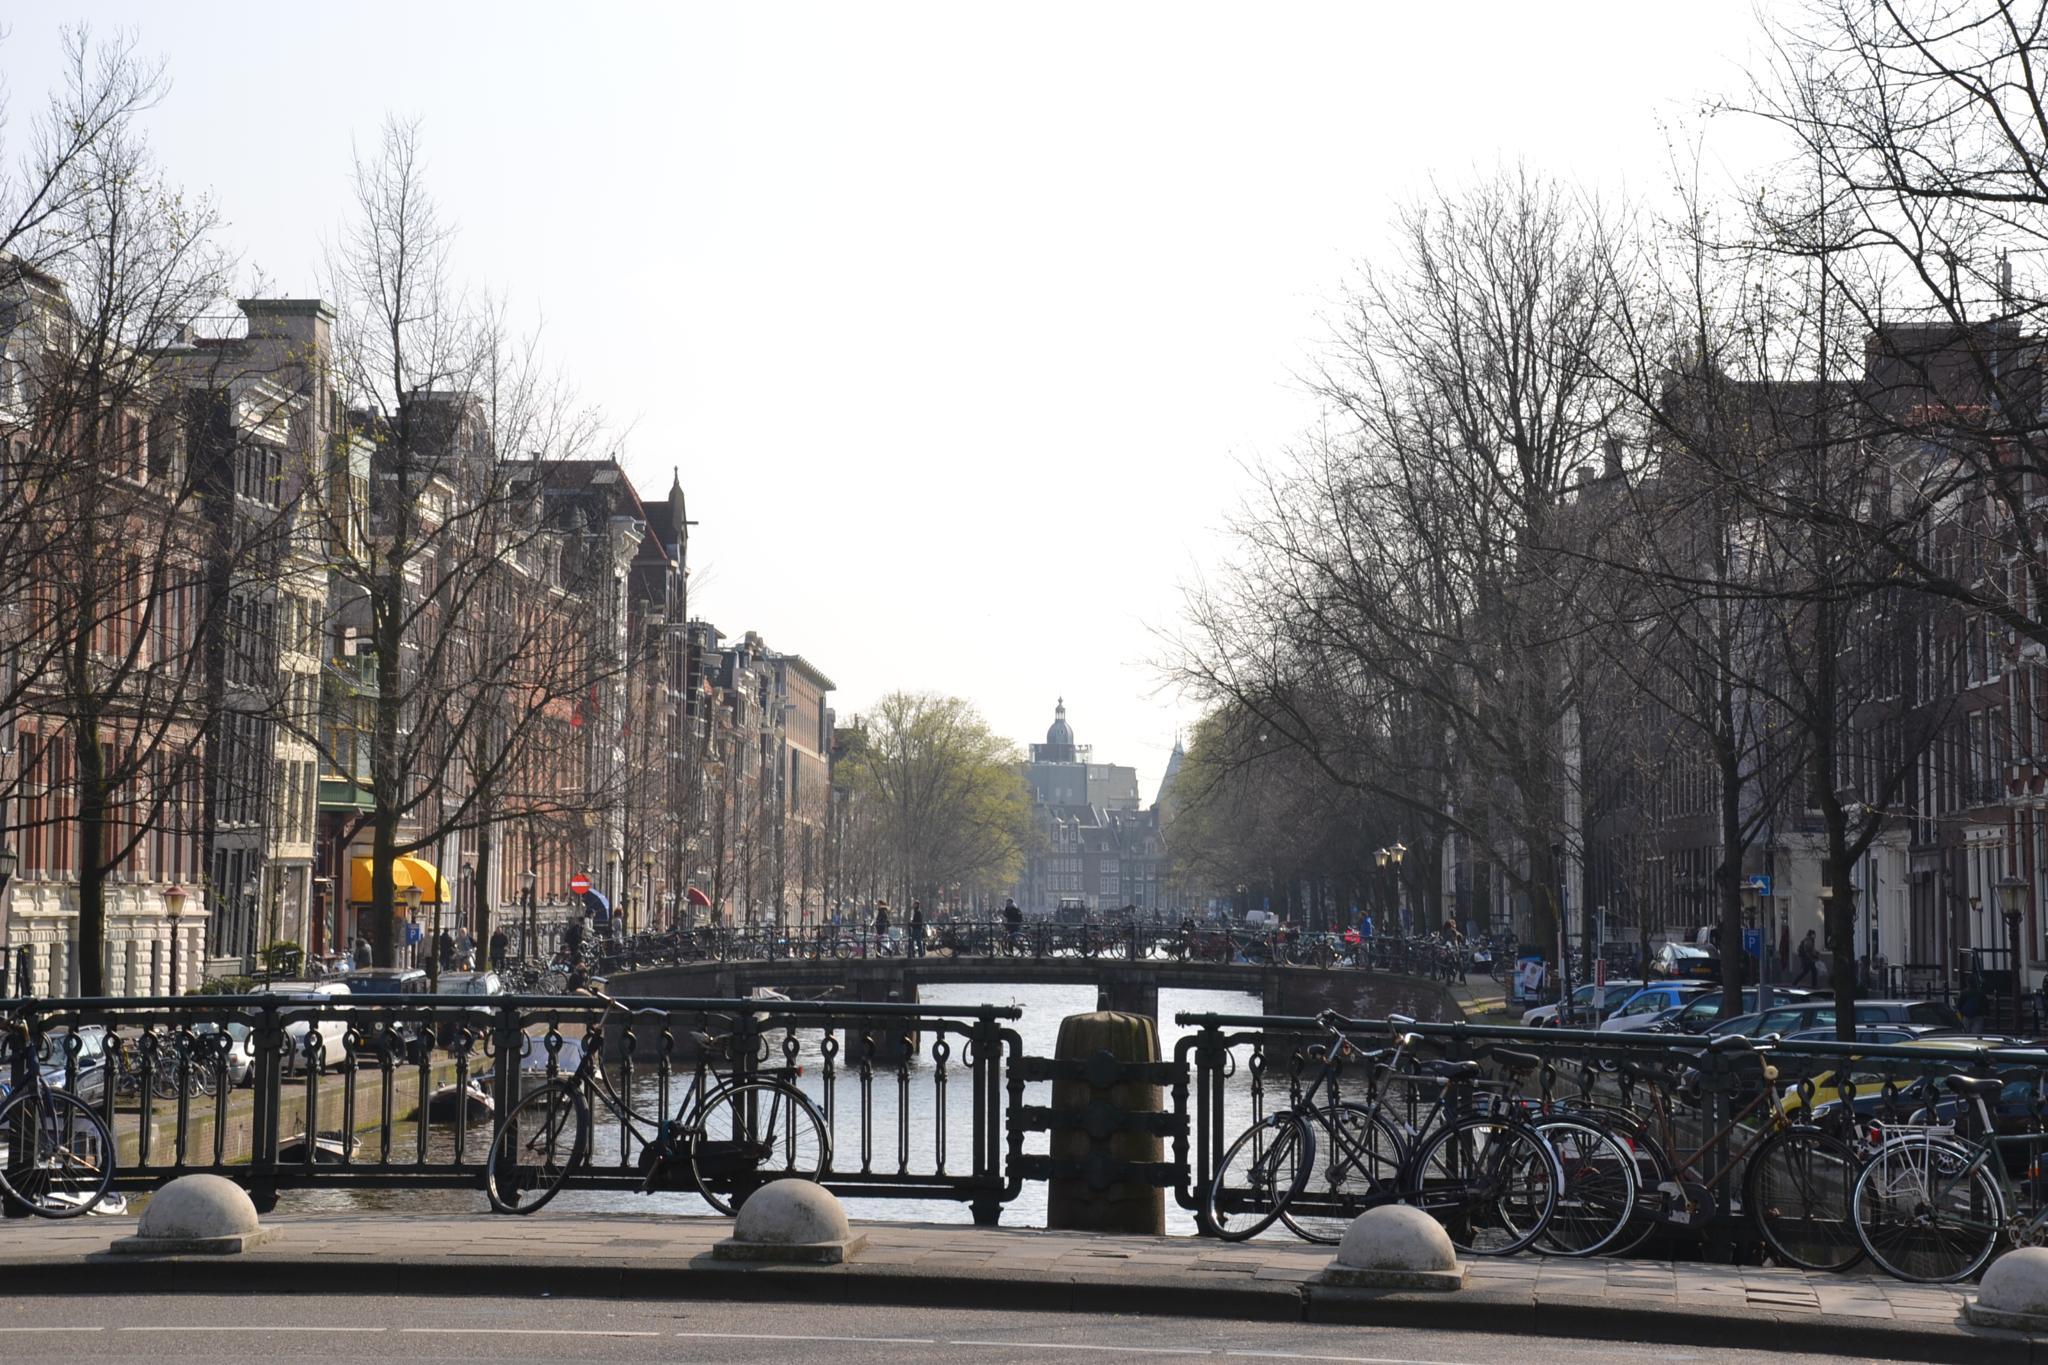 Vista del canal by xemariagil